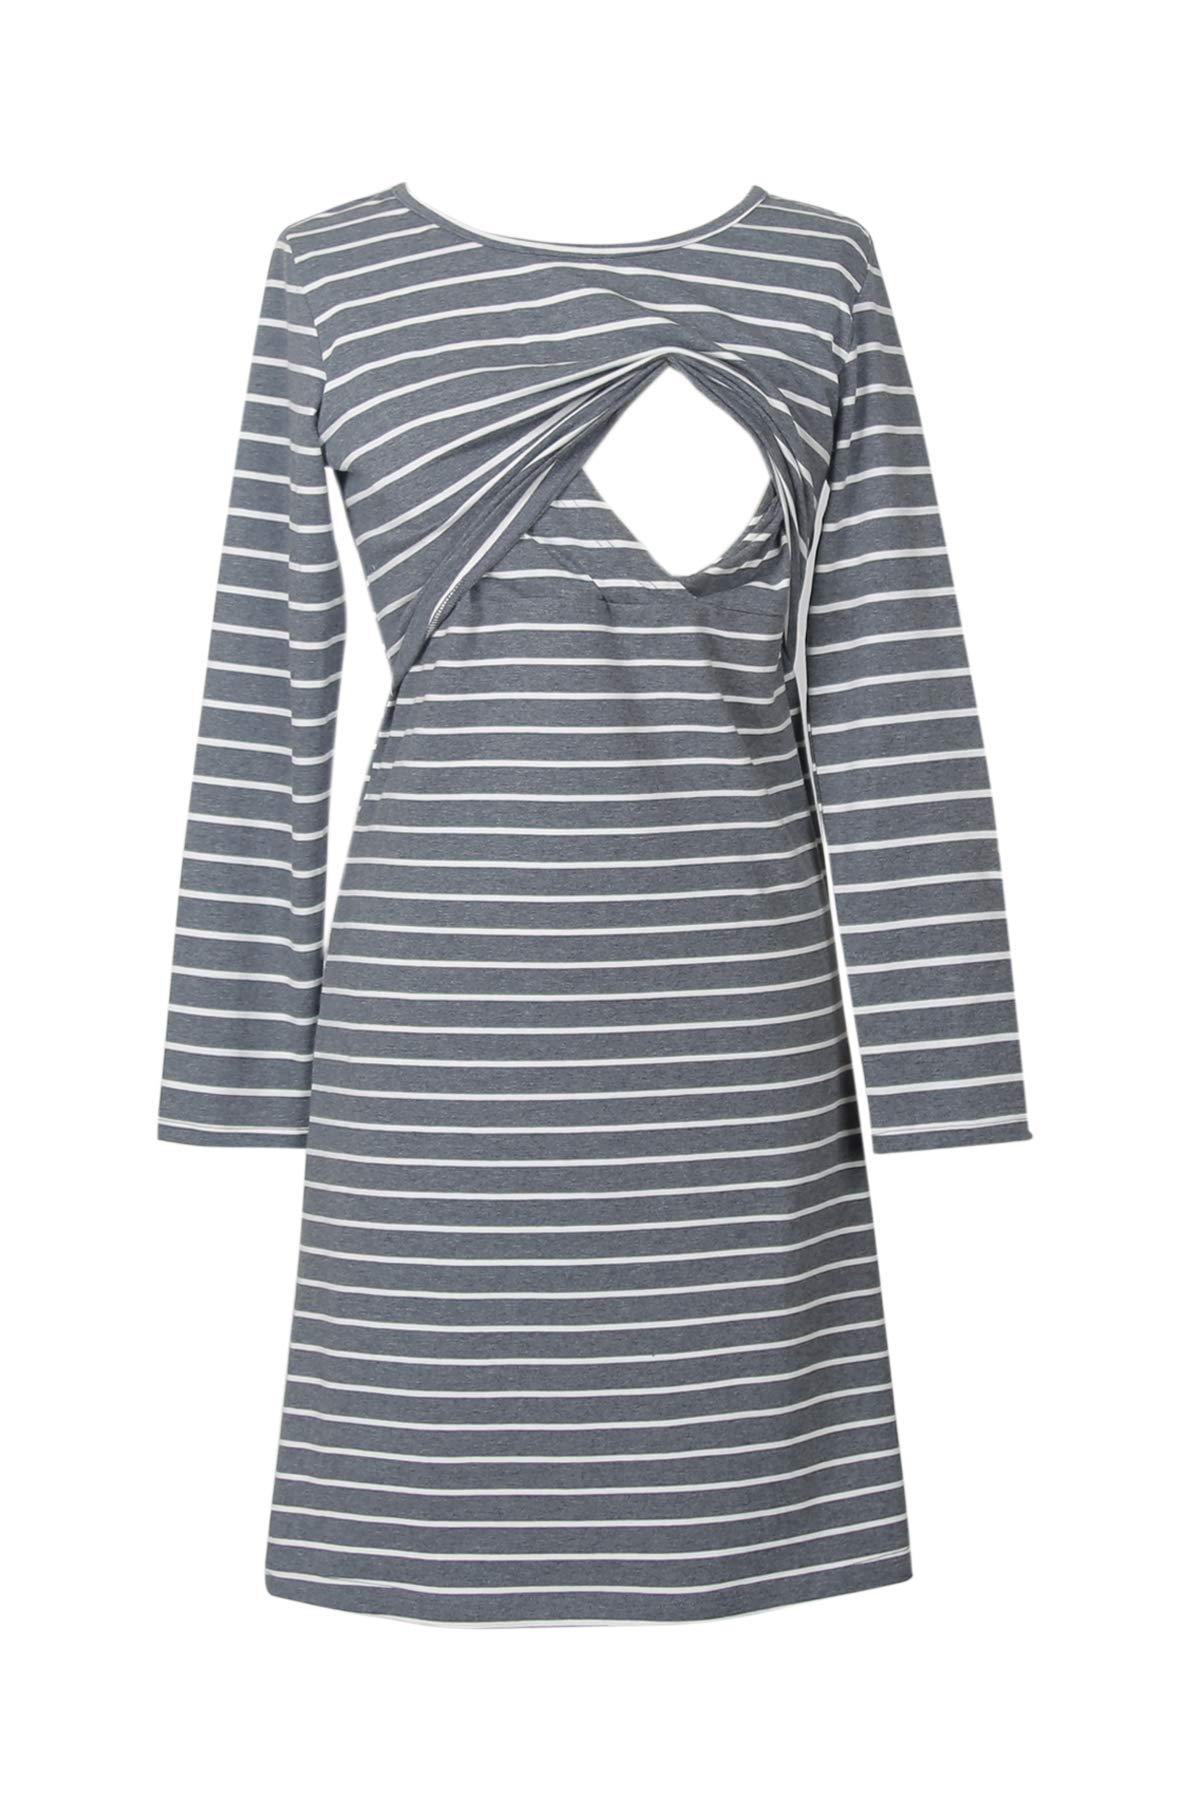 Smallshow Women's Stripes Nursing Dress Medium Dim Grey